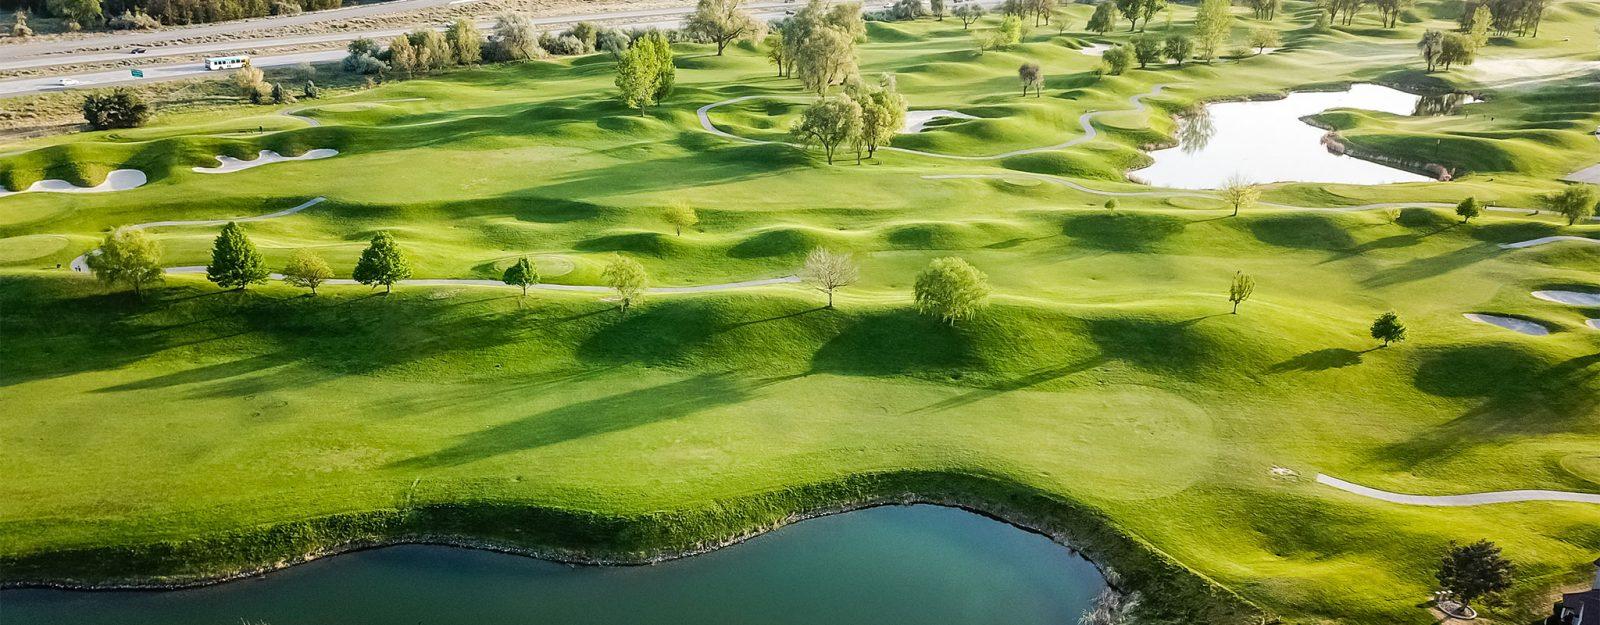 Golf course in Tri-Cities, Washington